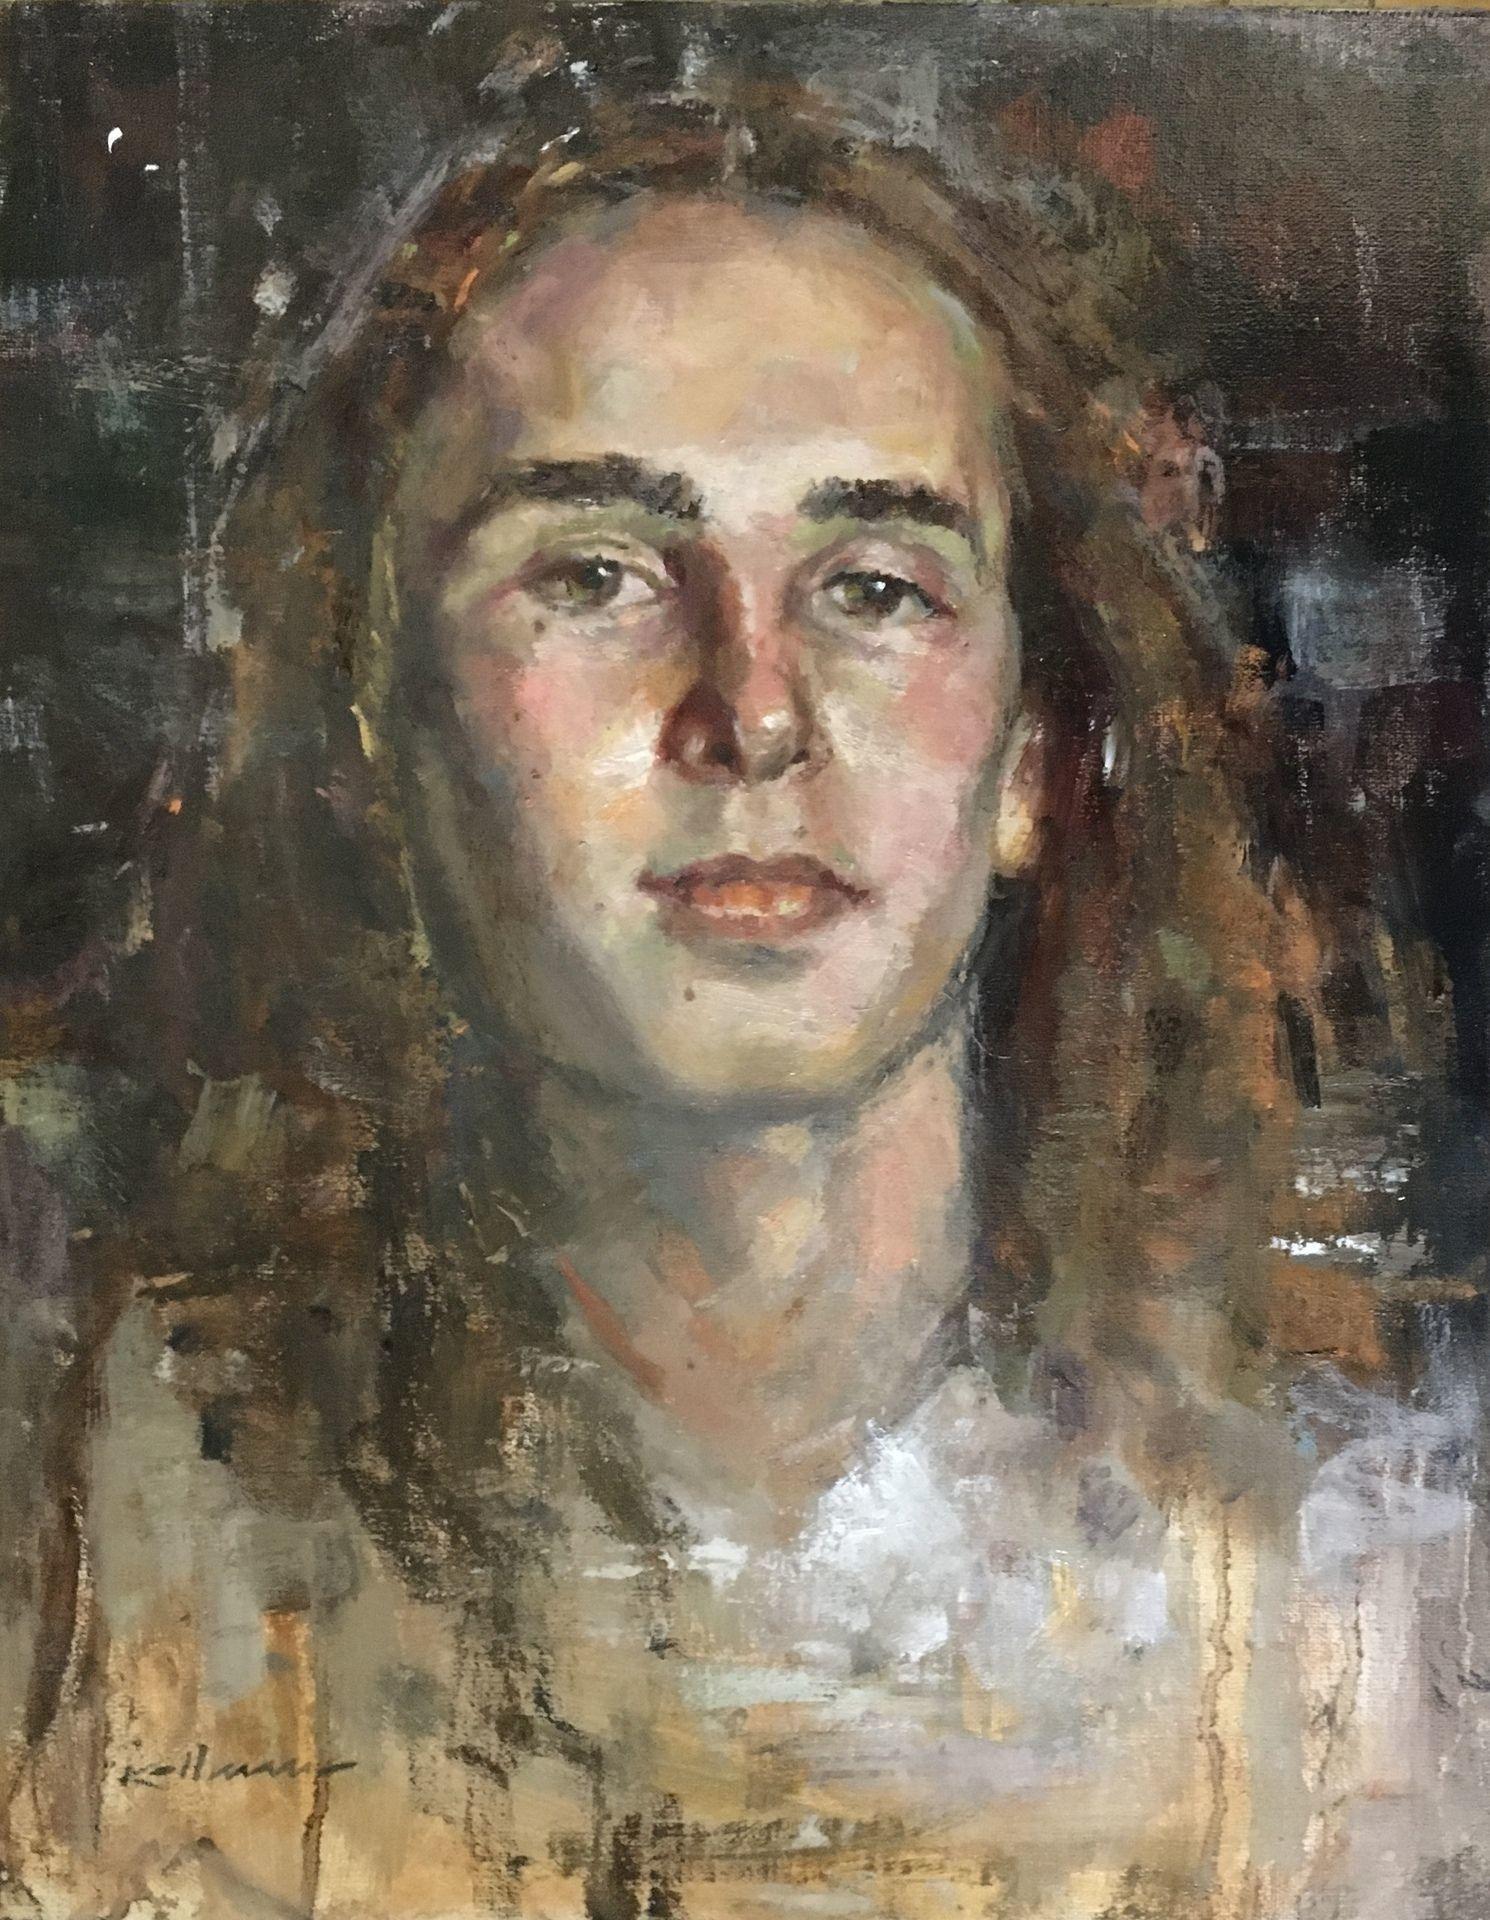 Joanne Radmilovich Kollman